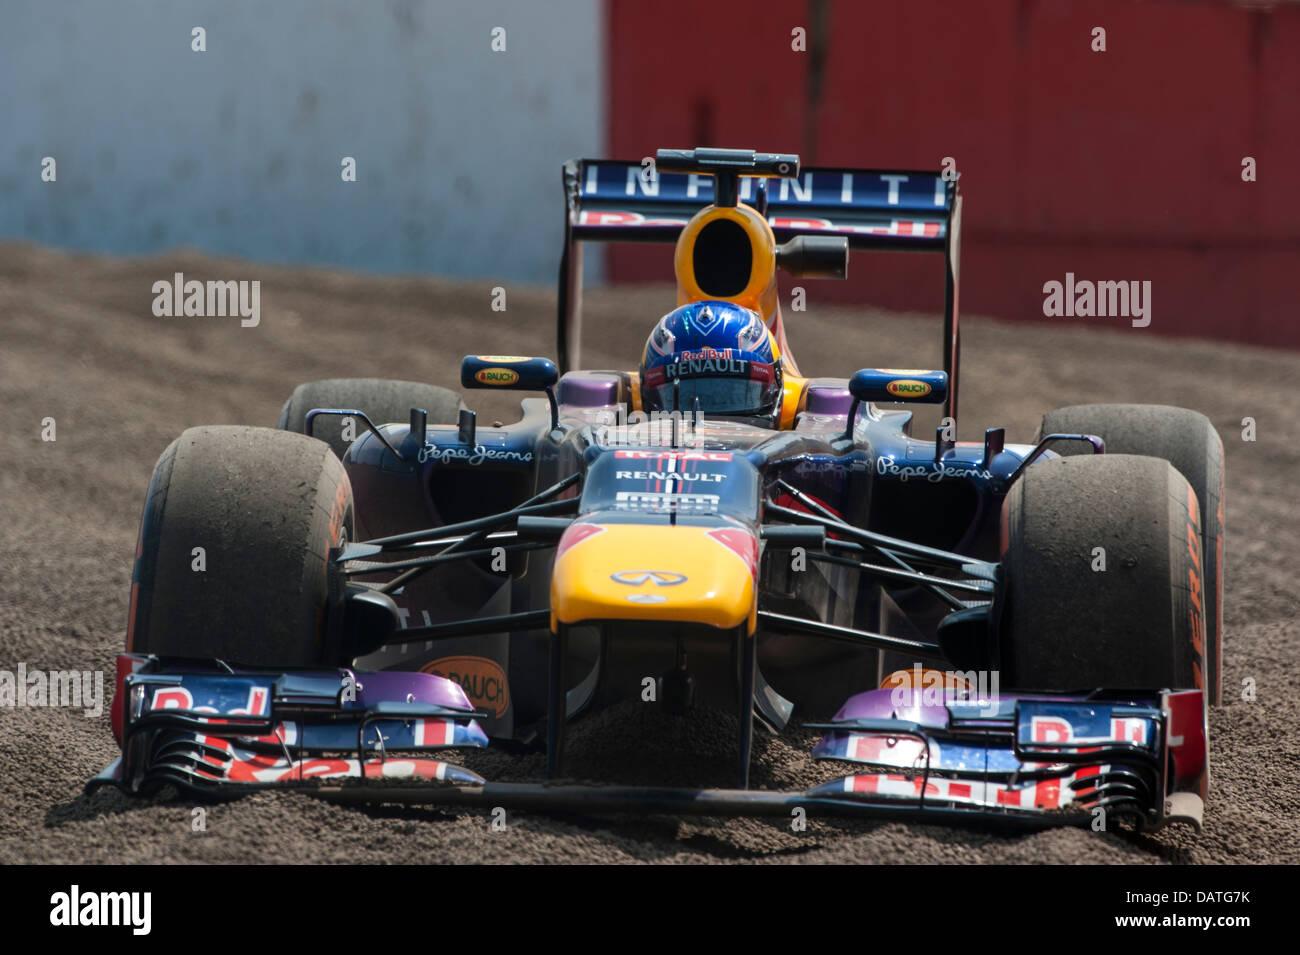 bffda69f970 Ricciardo Stock Photos   Ricciardo Stock Images - Alamy